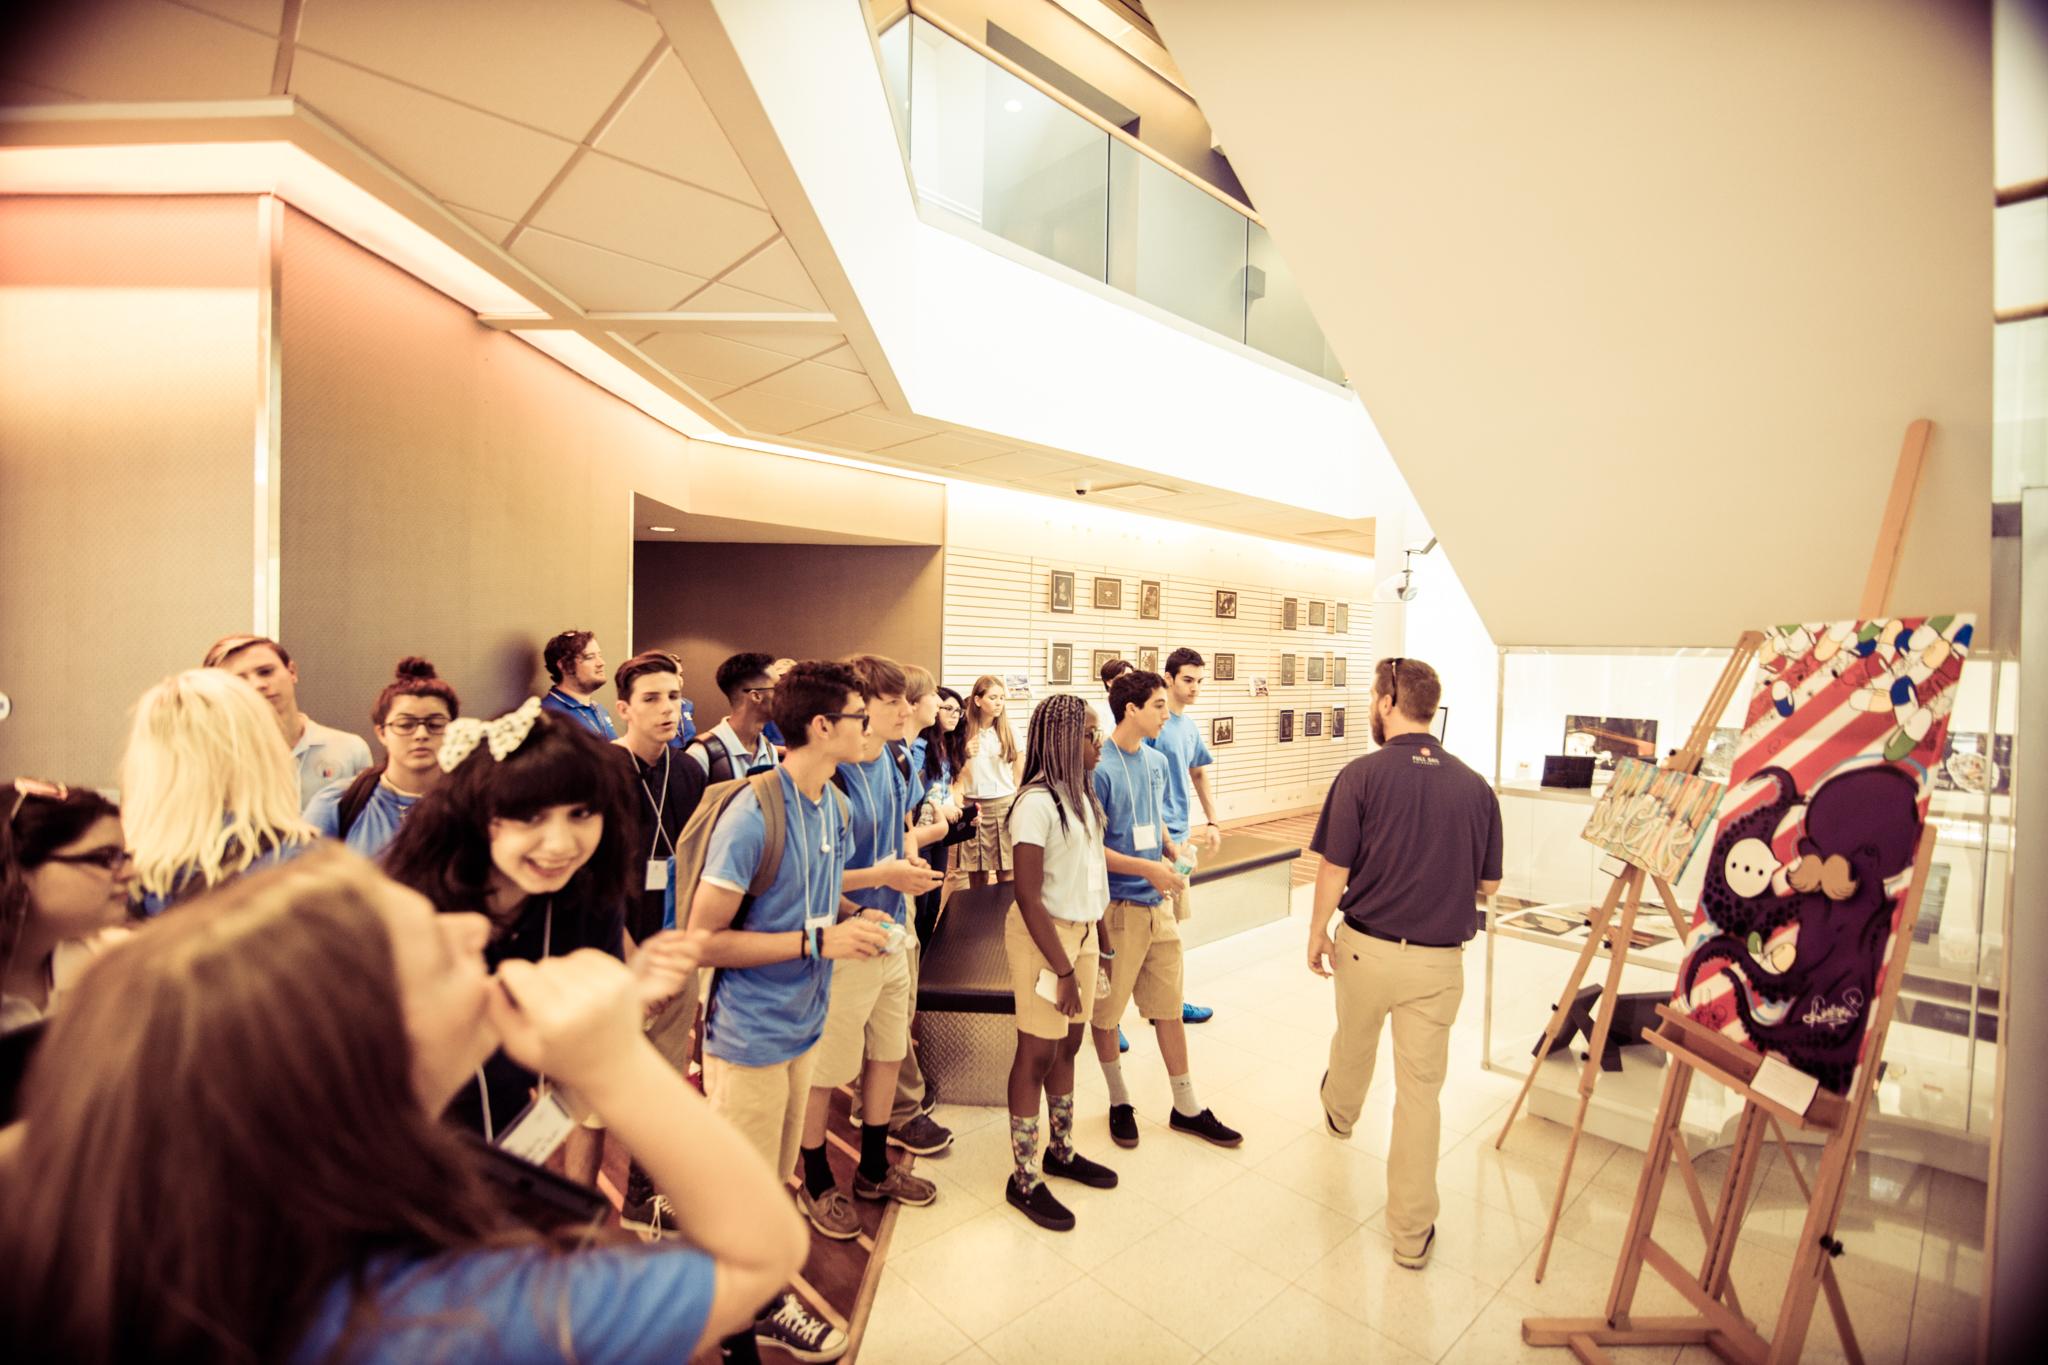 FS_LABS_One_School_of_the_Arts_Aug.25_19.jpg